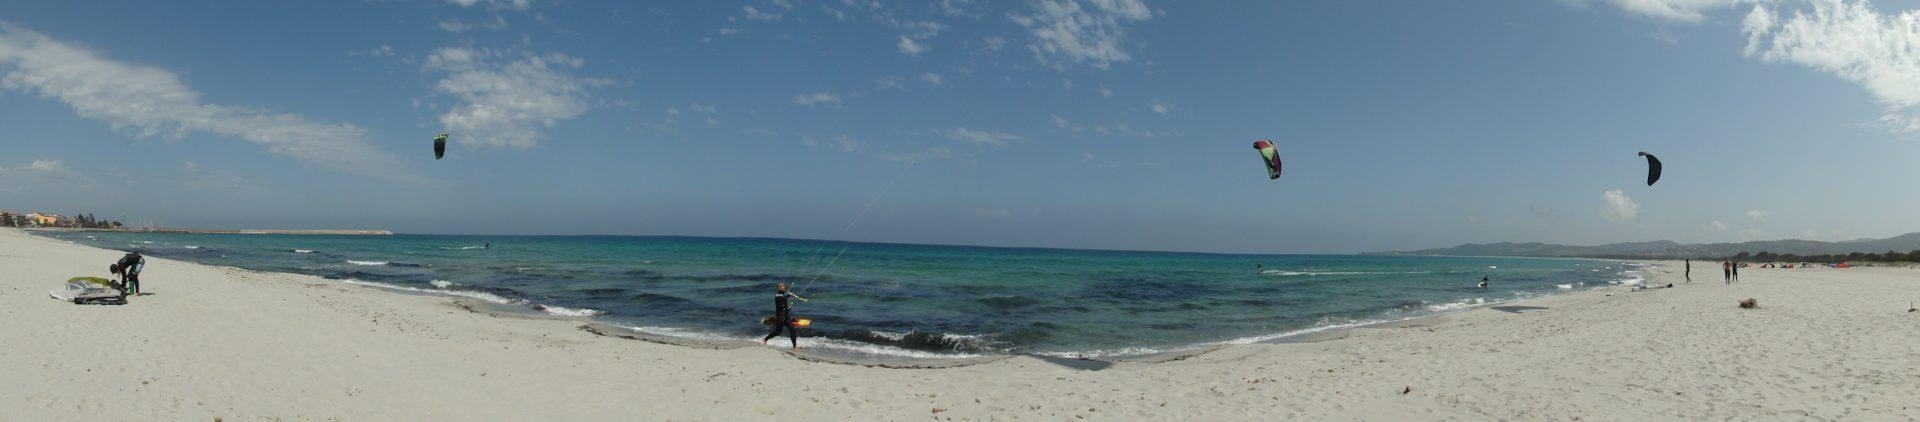 Kajtanje kitesurfing Sardinija